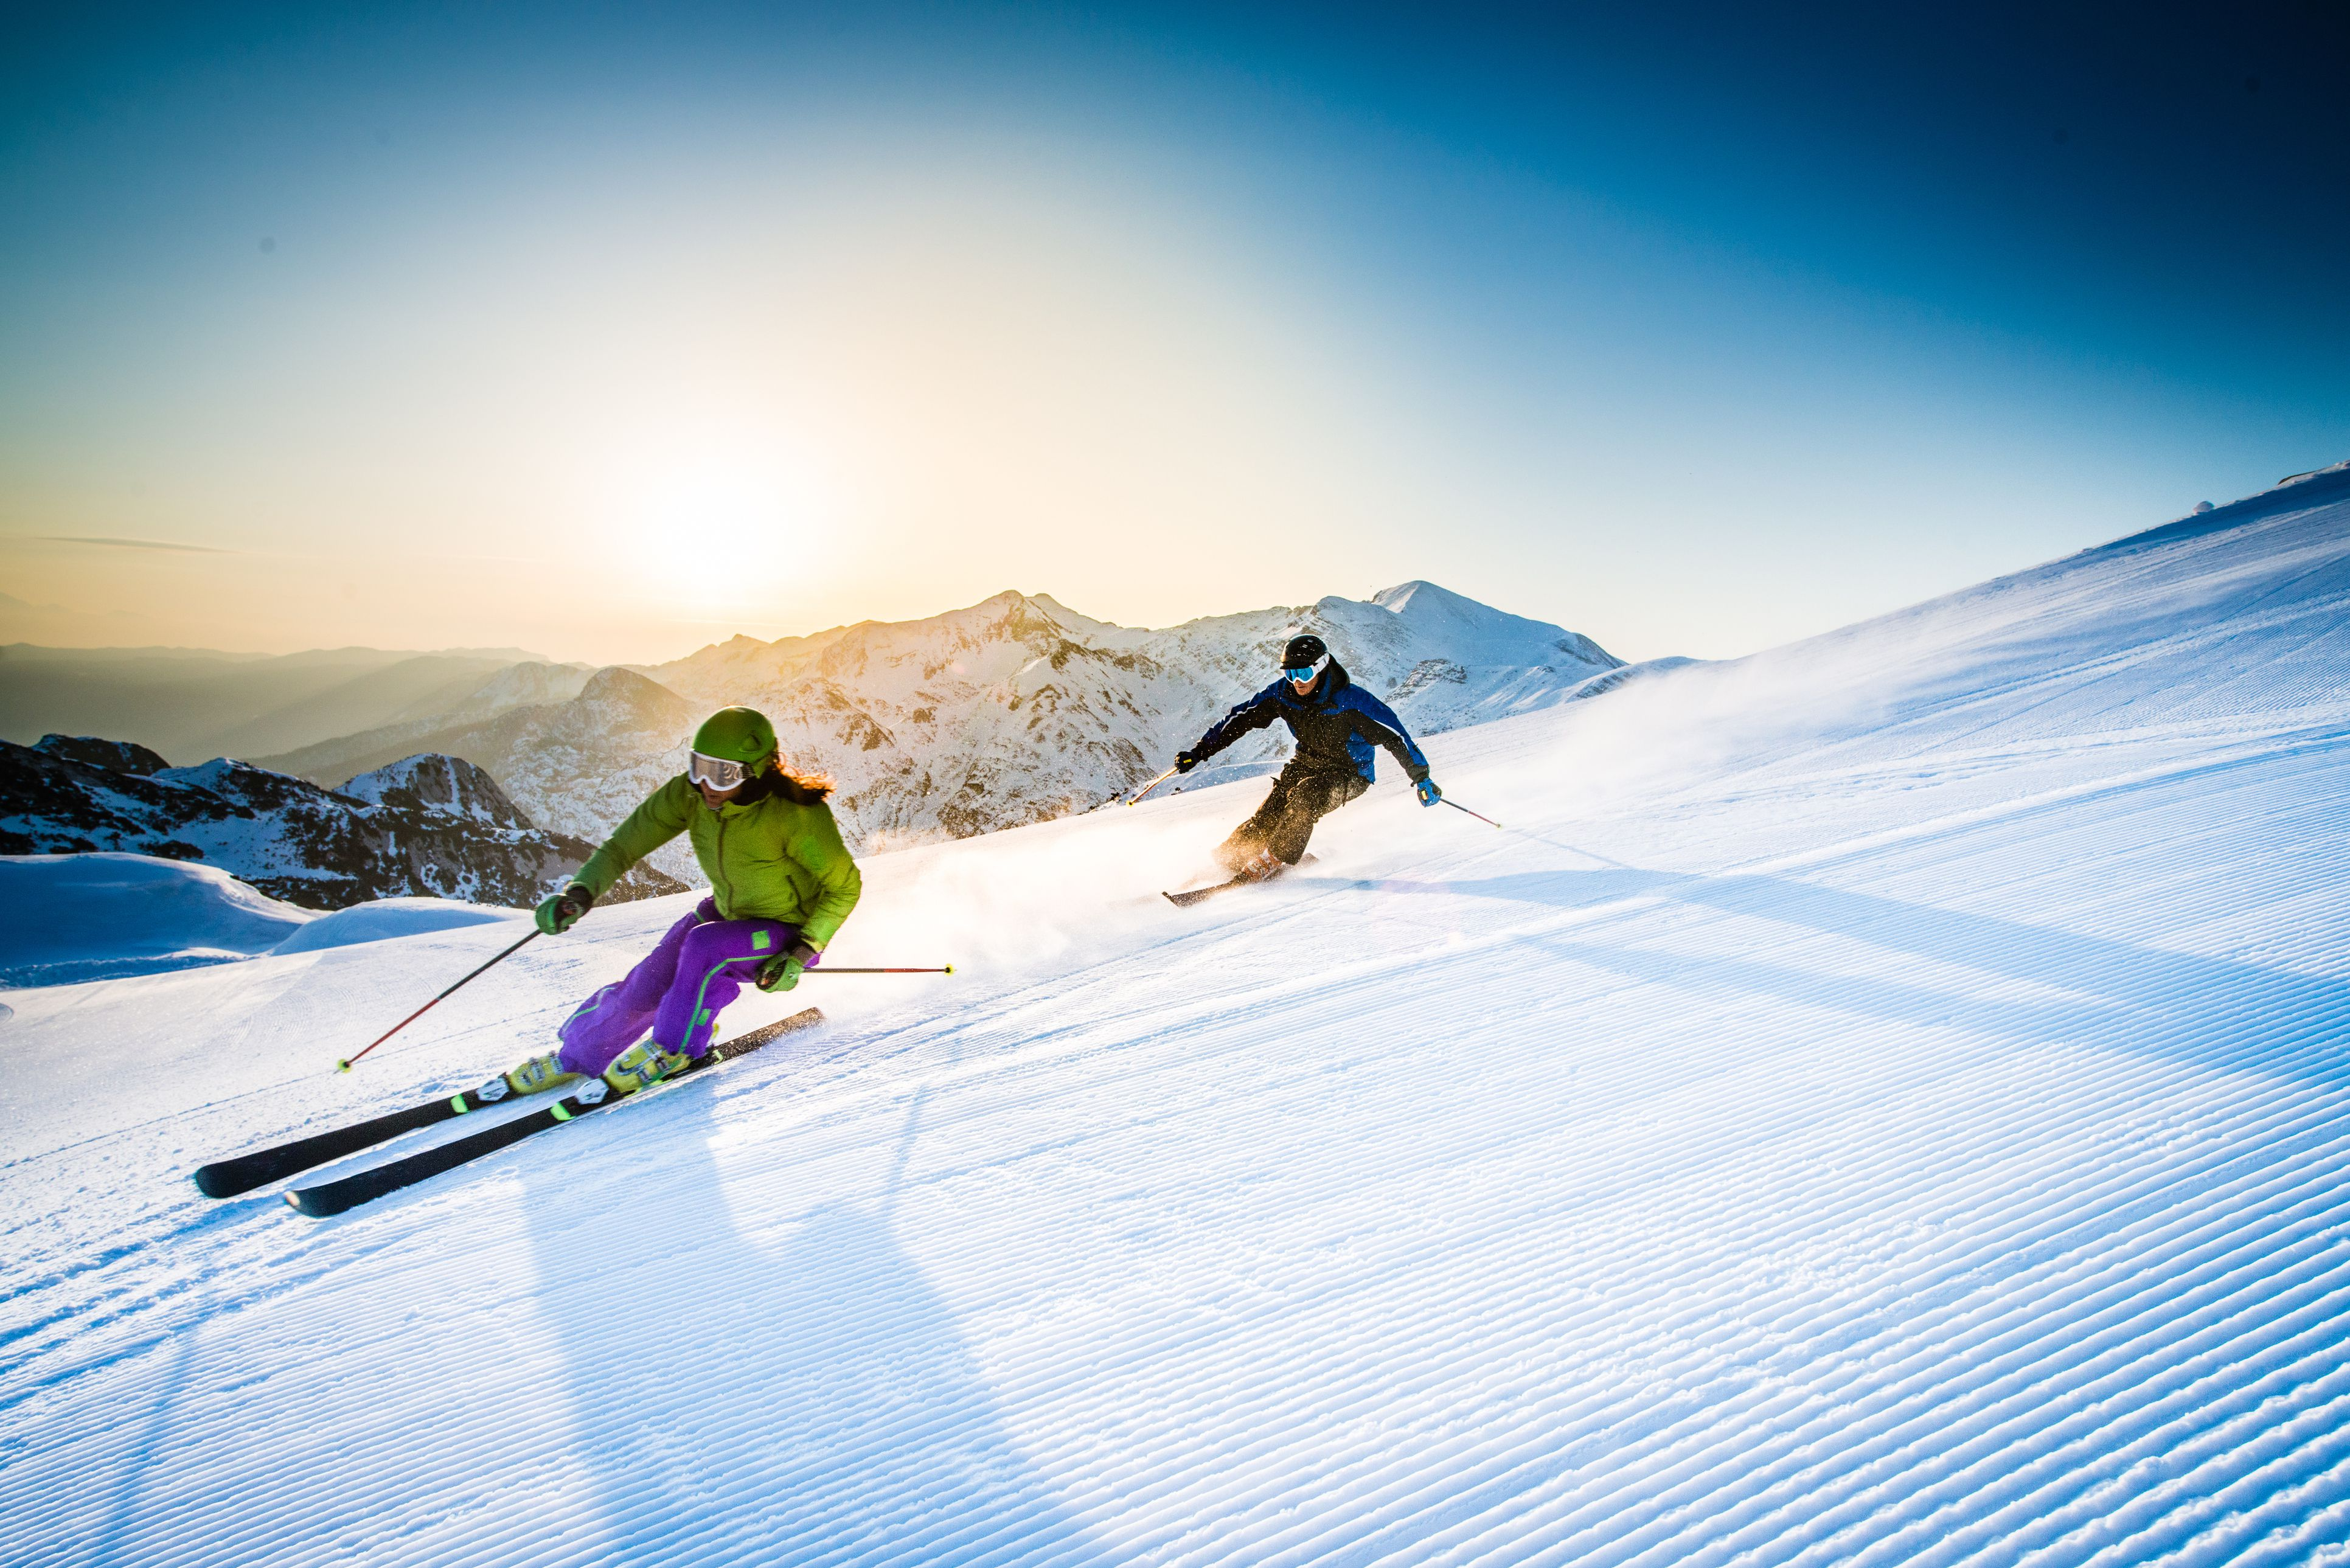 Man and woman skiing downhill